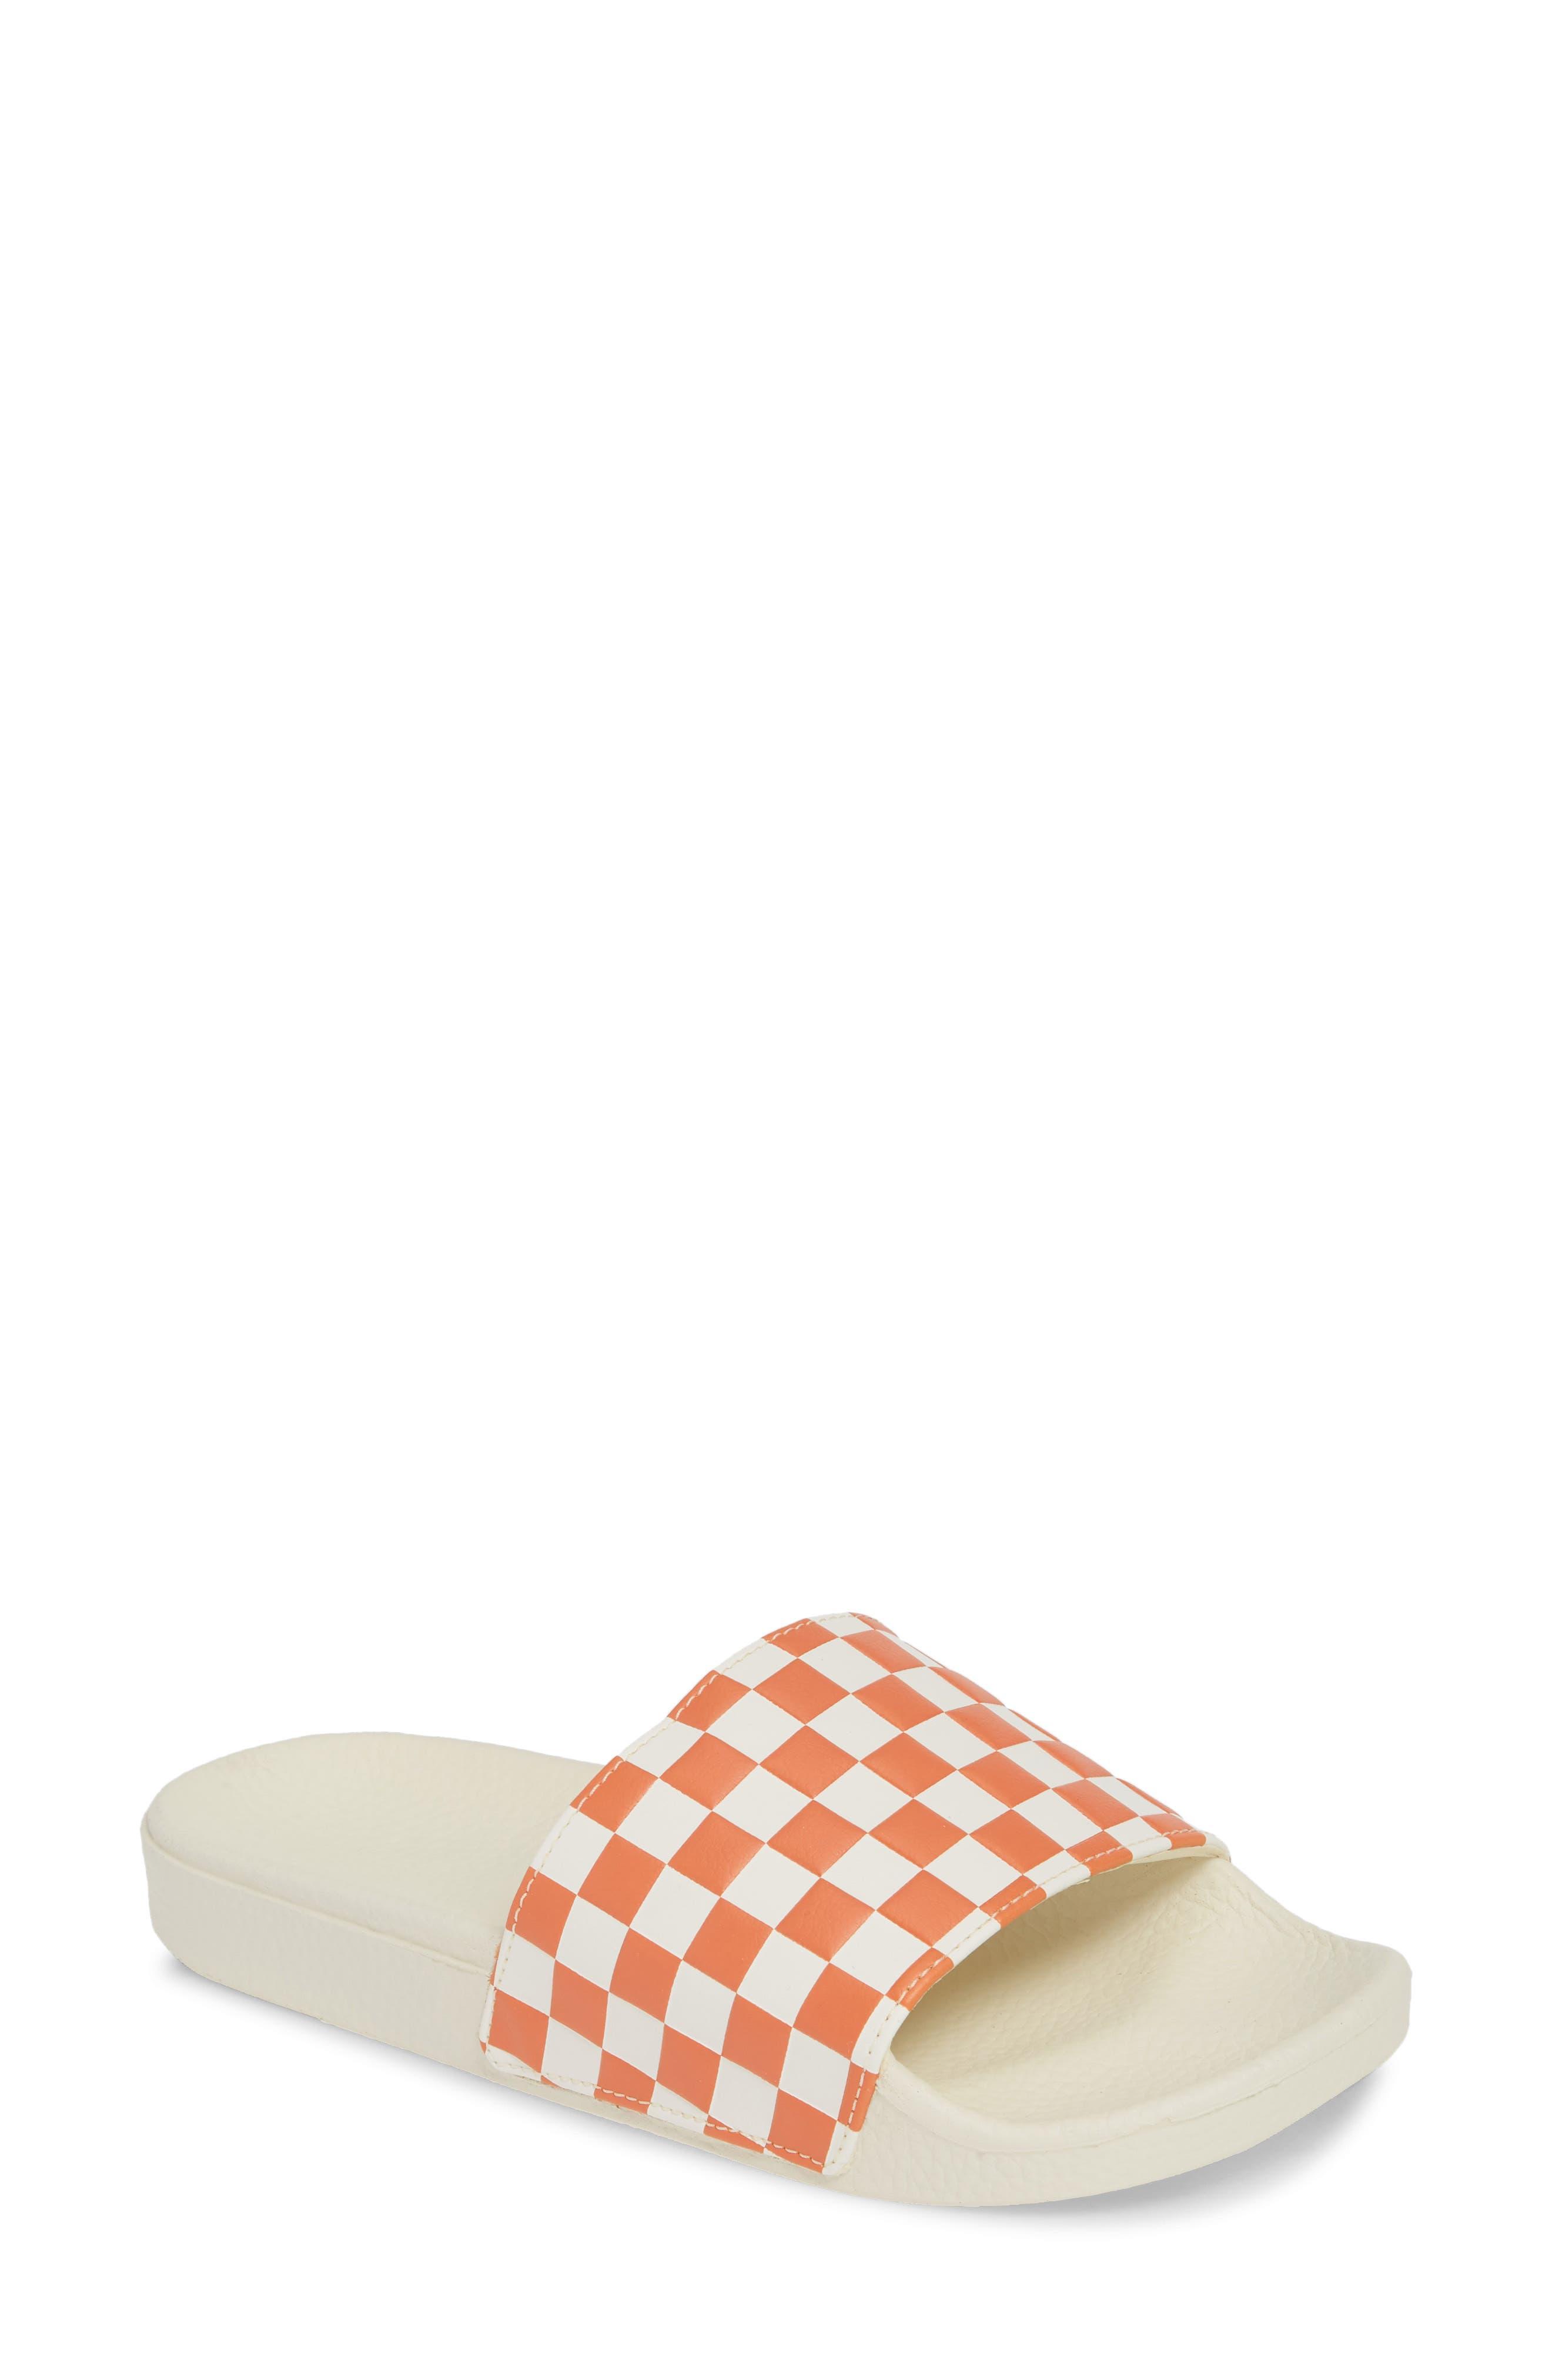 Vans Checkerboard Sport Slide, Red